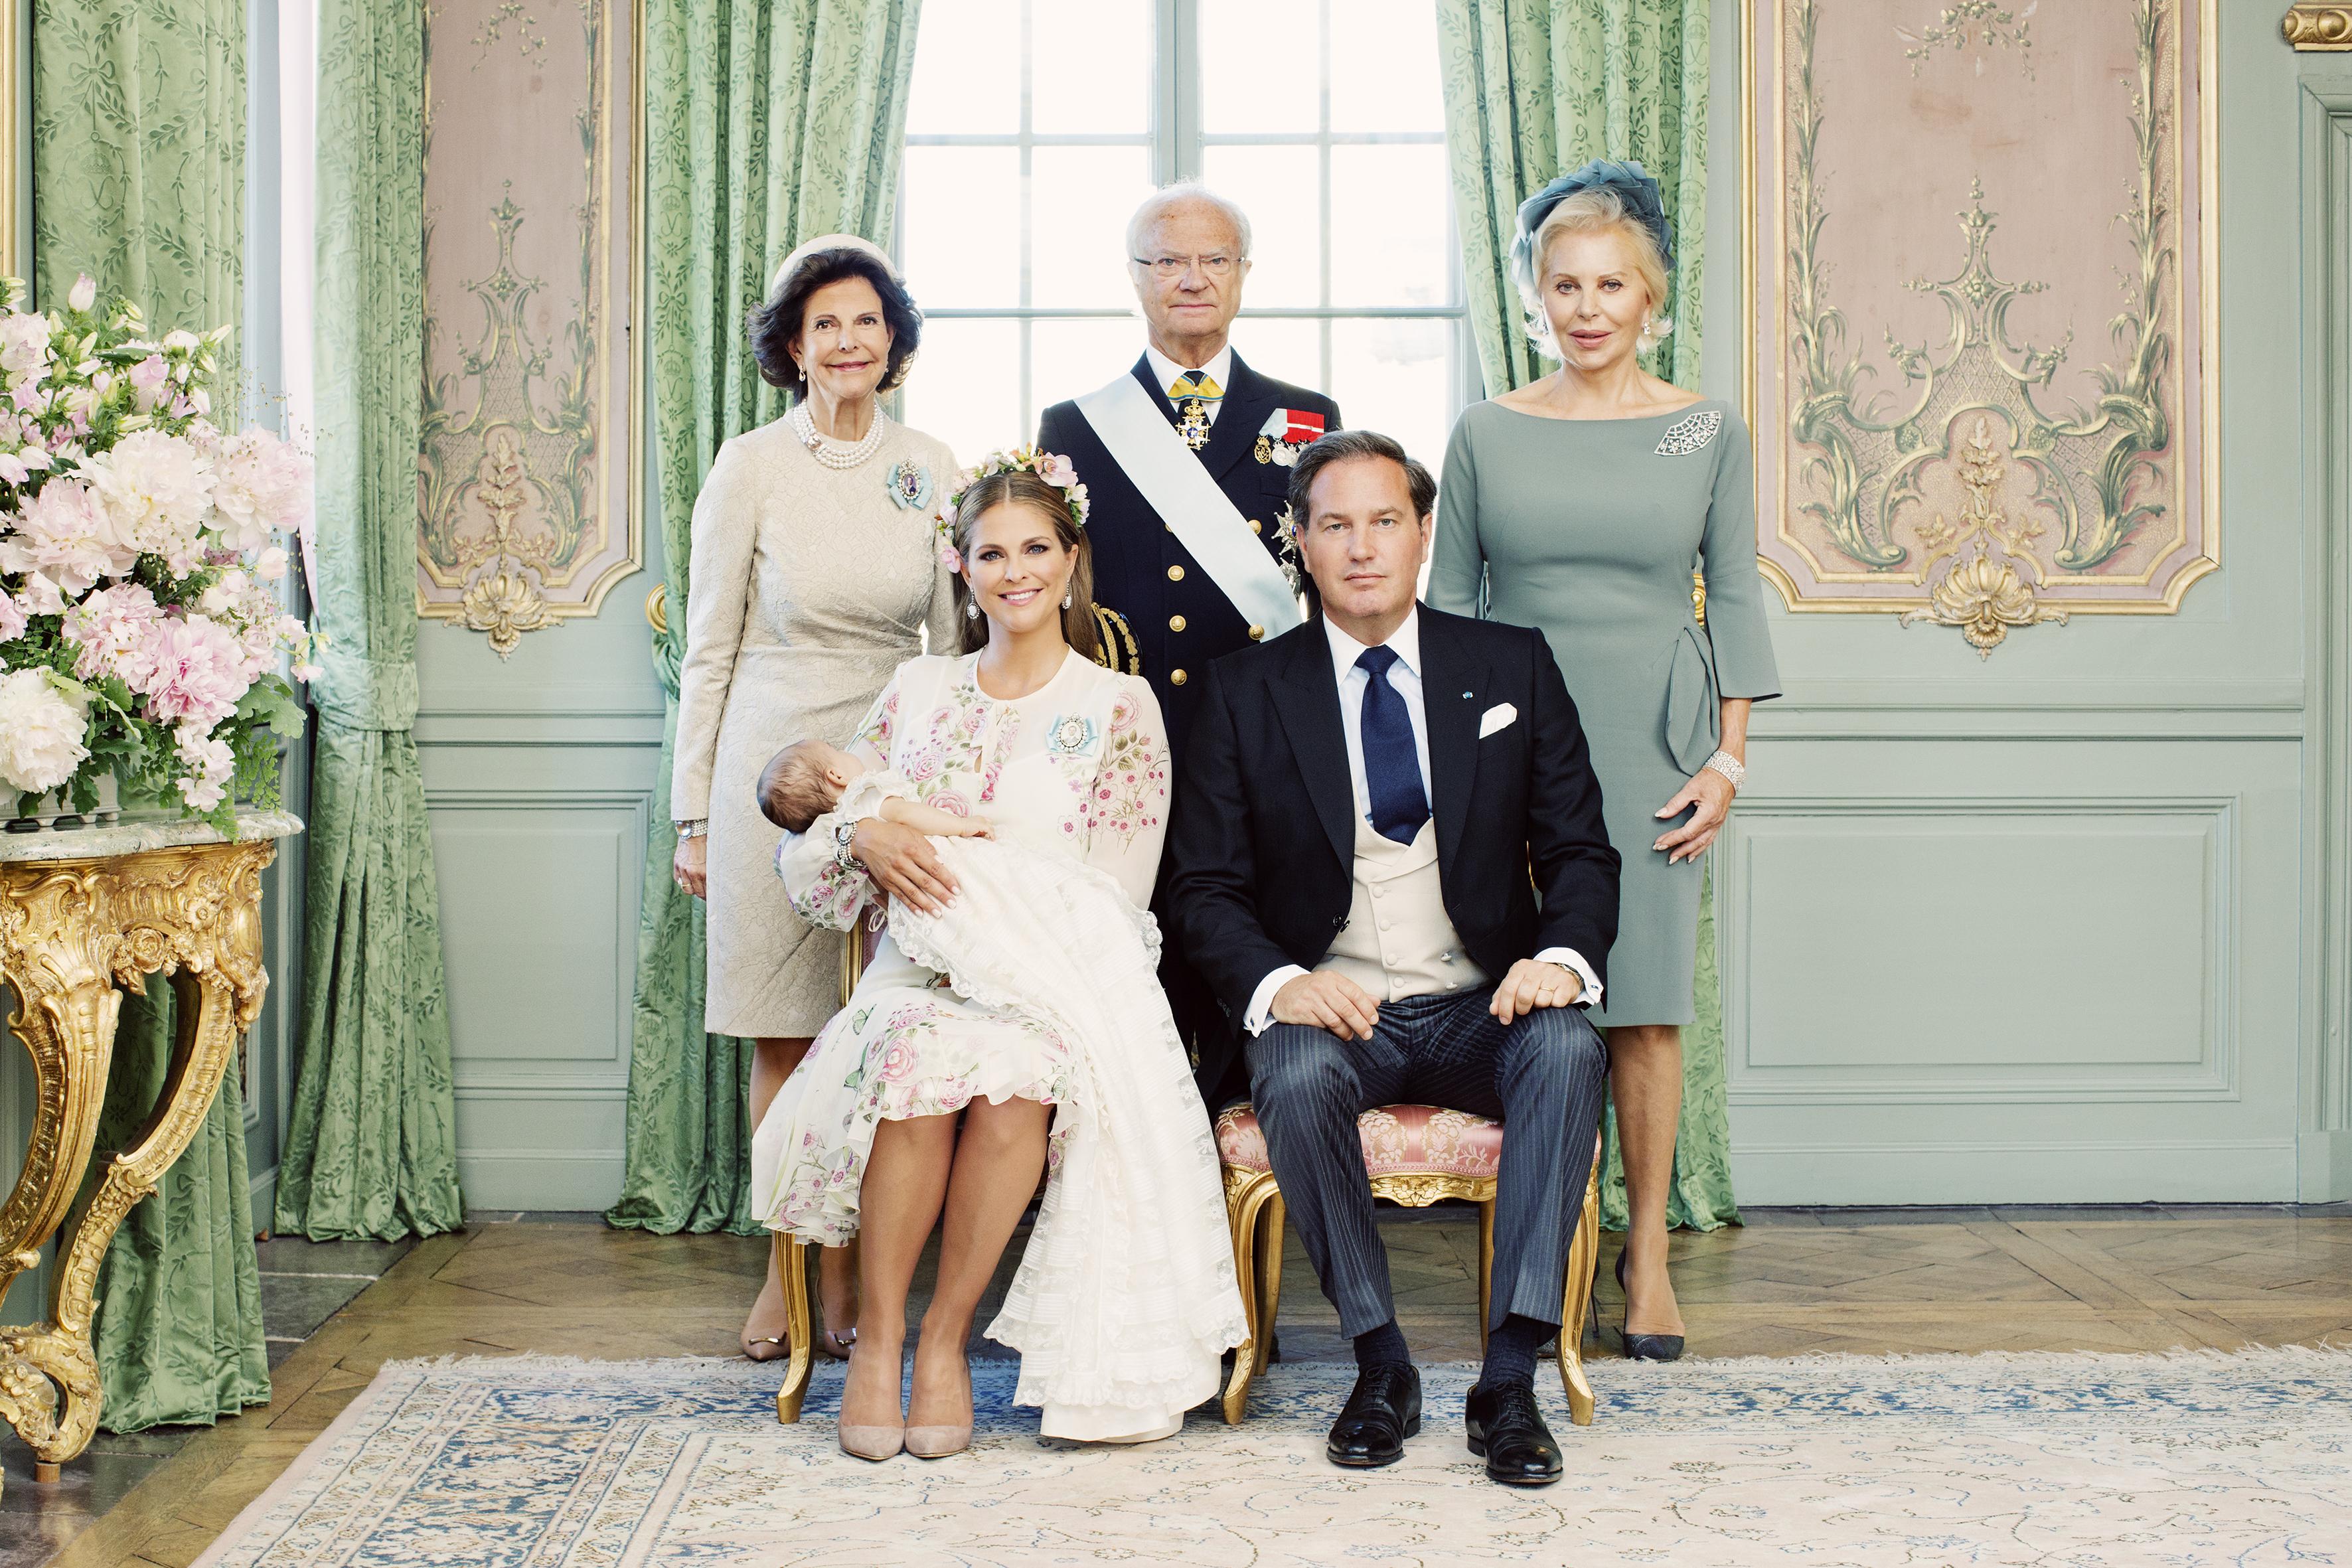 H.K.H. Prinsessan Adriennes dop, Drottningholms Slottskyrka 8 juni 2018. HRH Princess Adrienne's christening in Drottningholm Palace Chapel, June 8, 2018